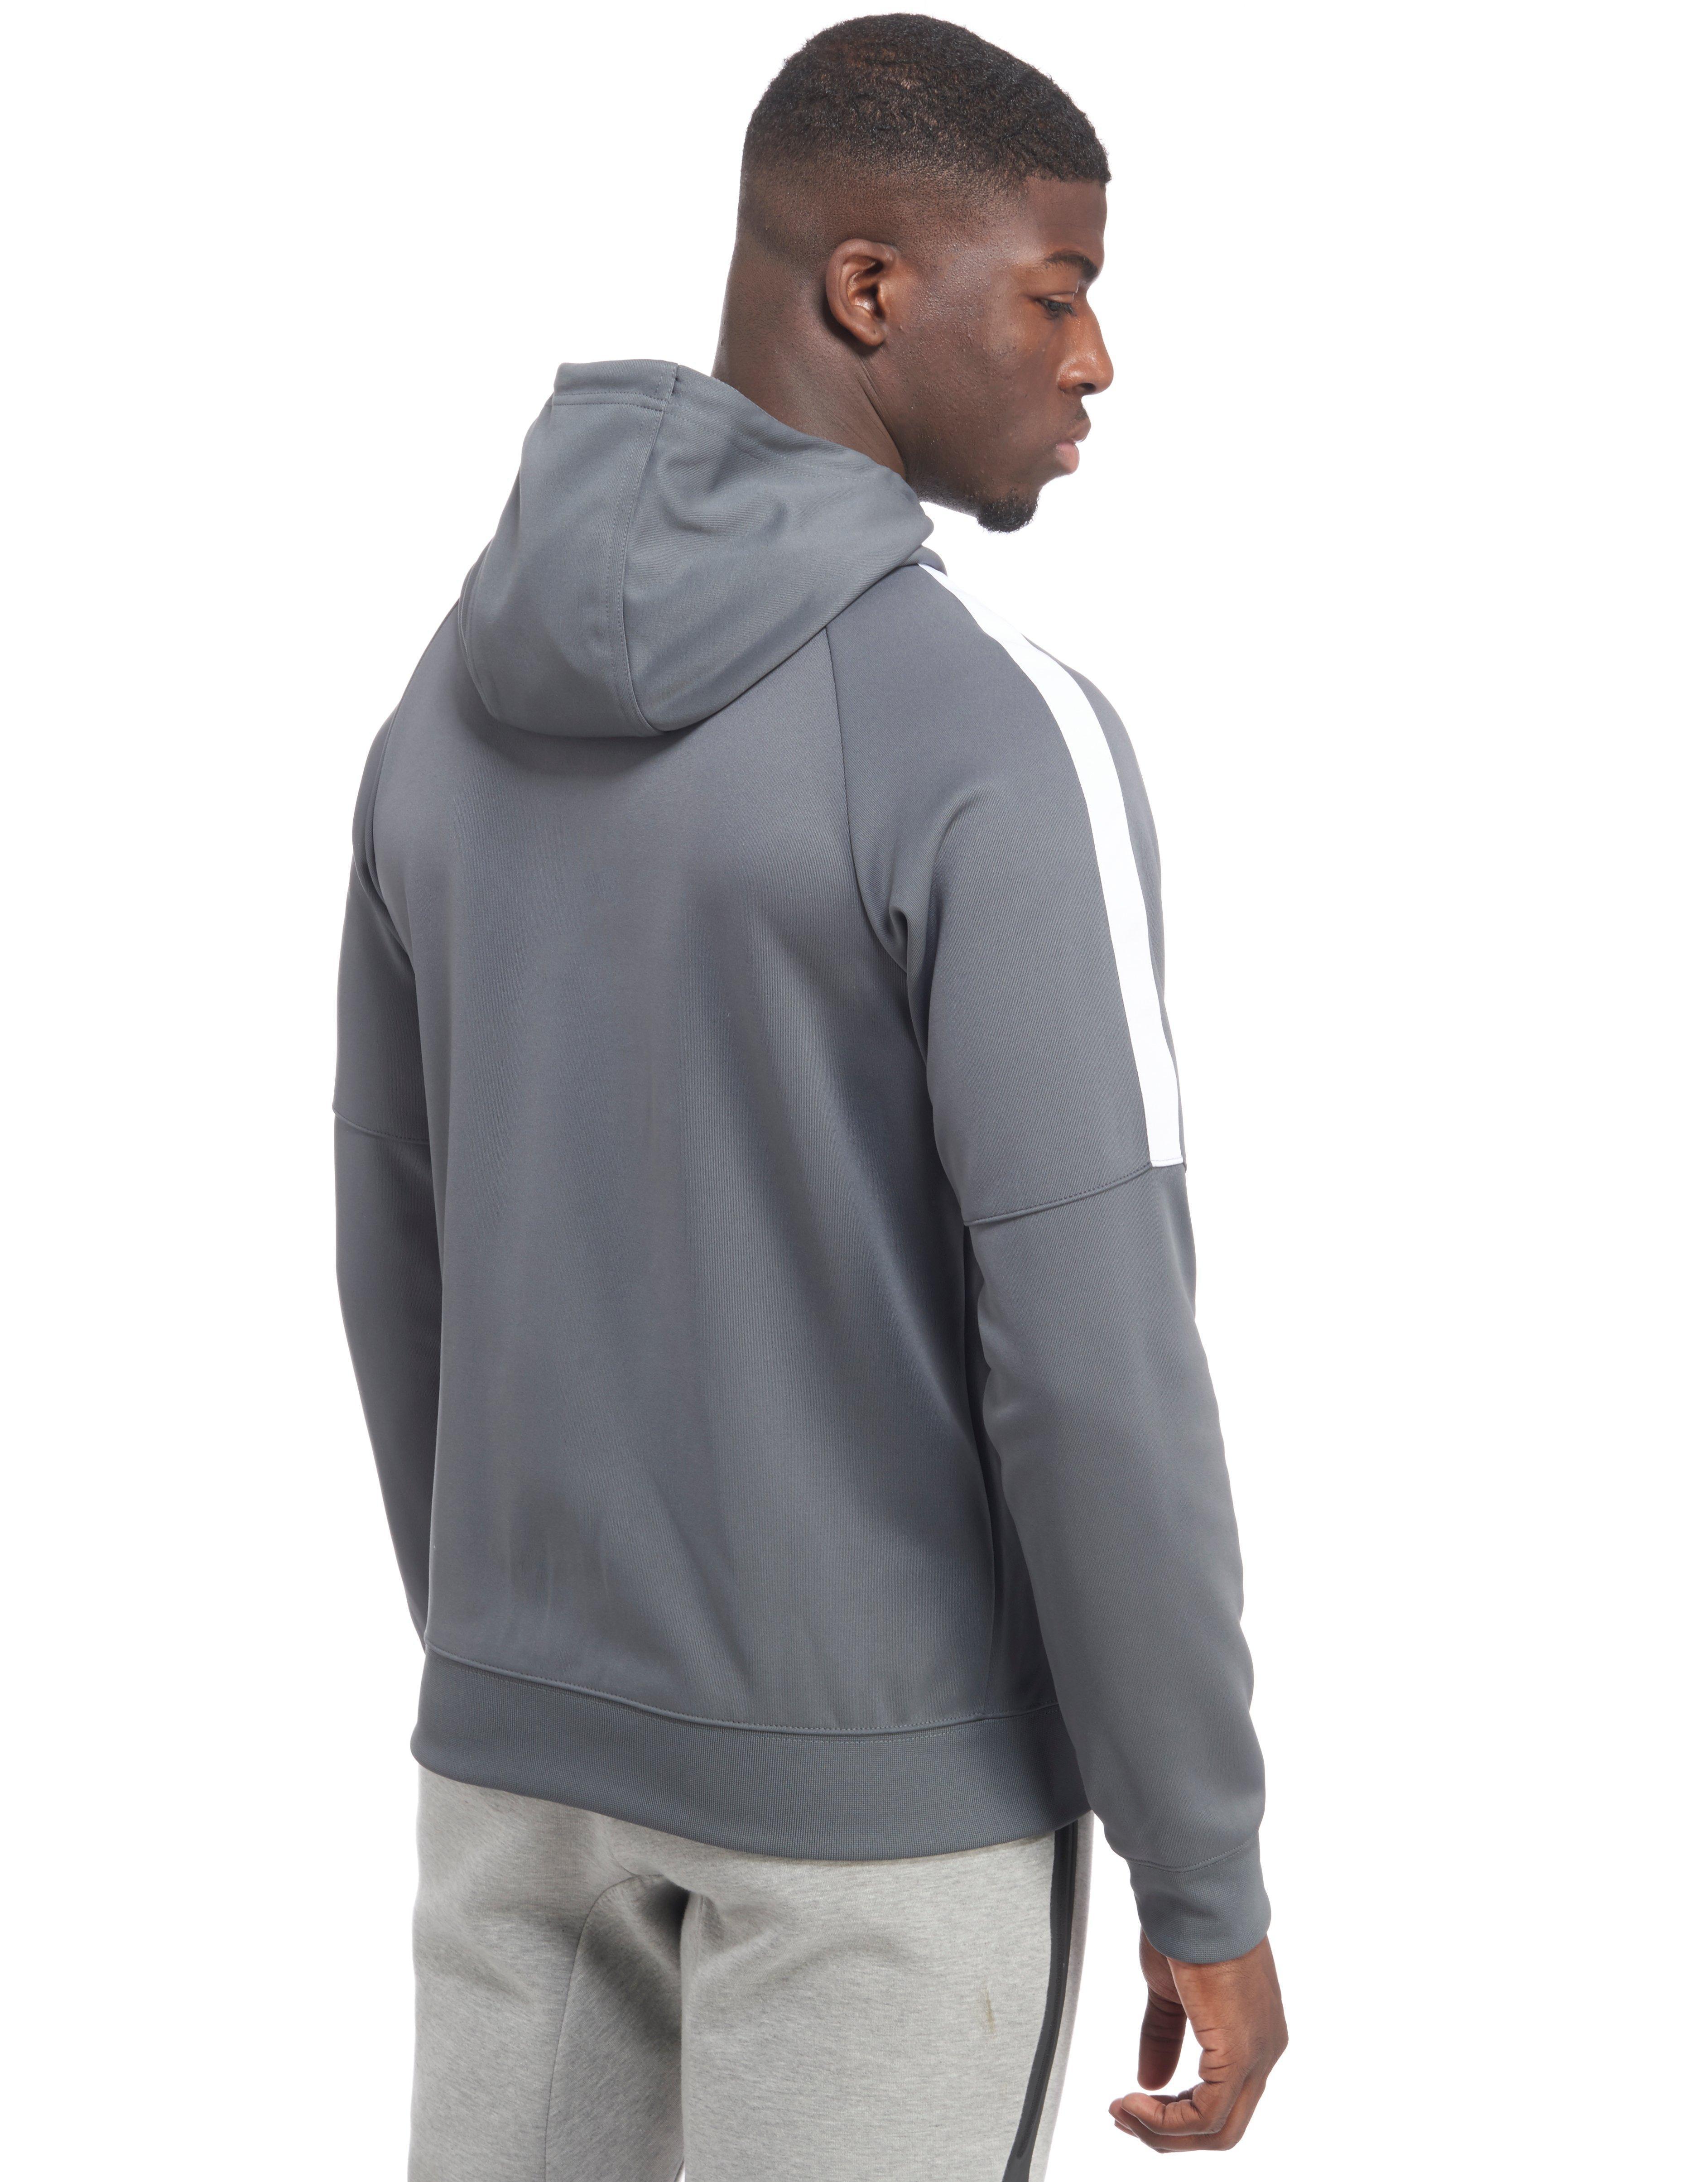 Nike Tribute Full Zip Poly Hoody in Gray for Men - Lyst 80dc67a05